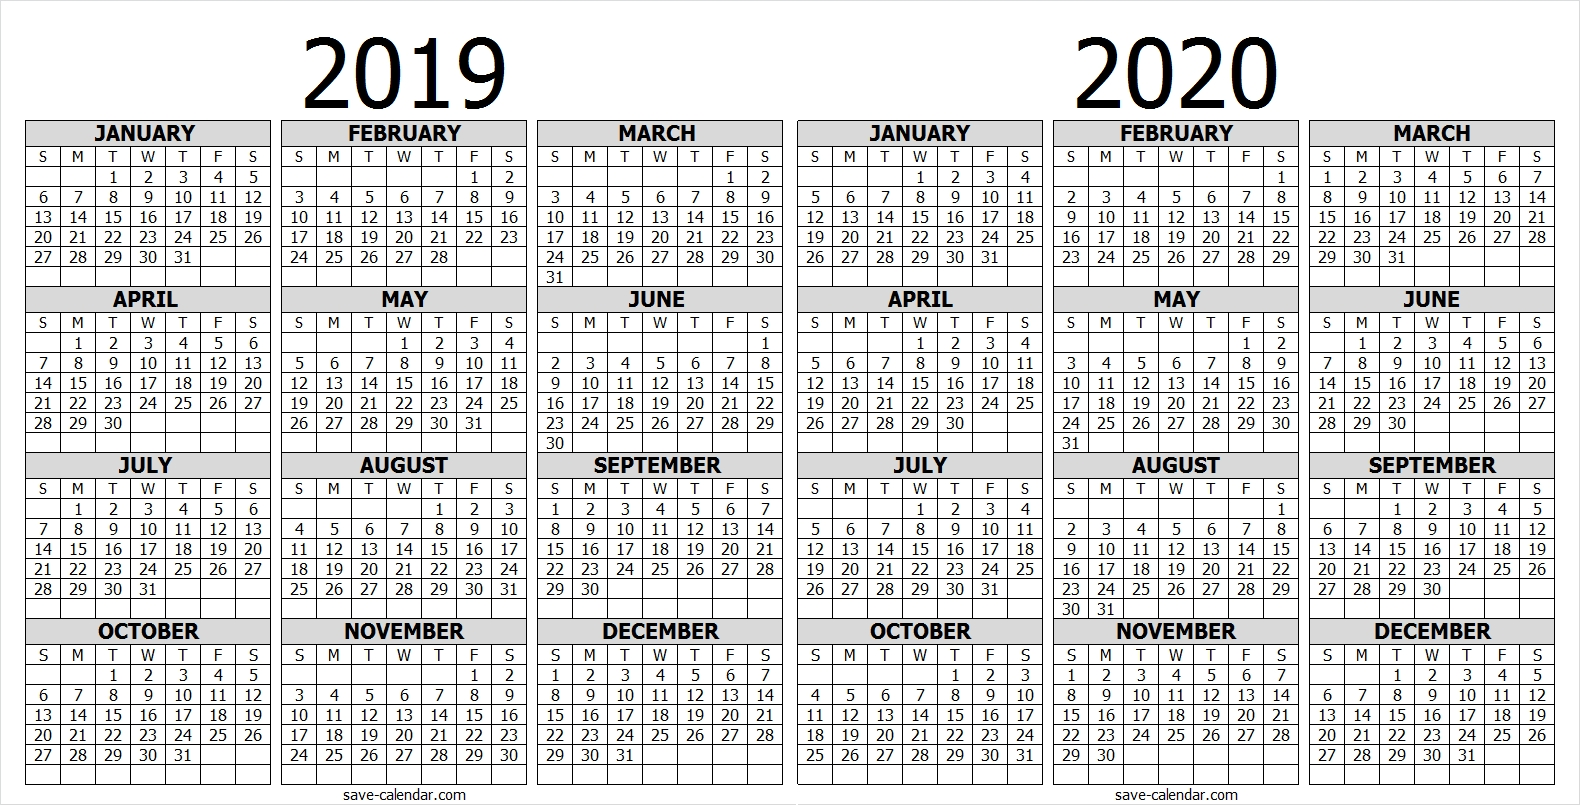 Calendar 2019 2020 One Page | 2019 Calendar | Free Calendar within Free Printable 2019 2020 Calendar